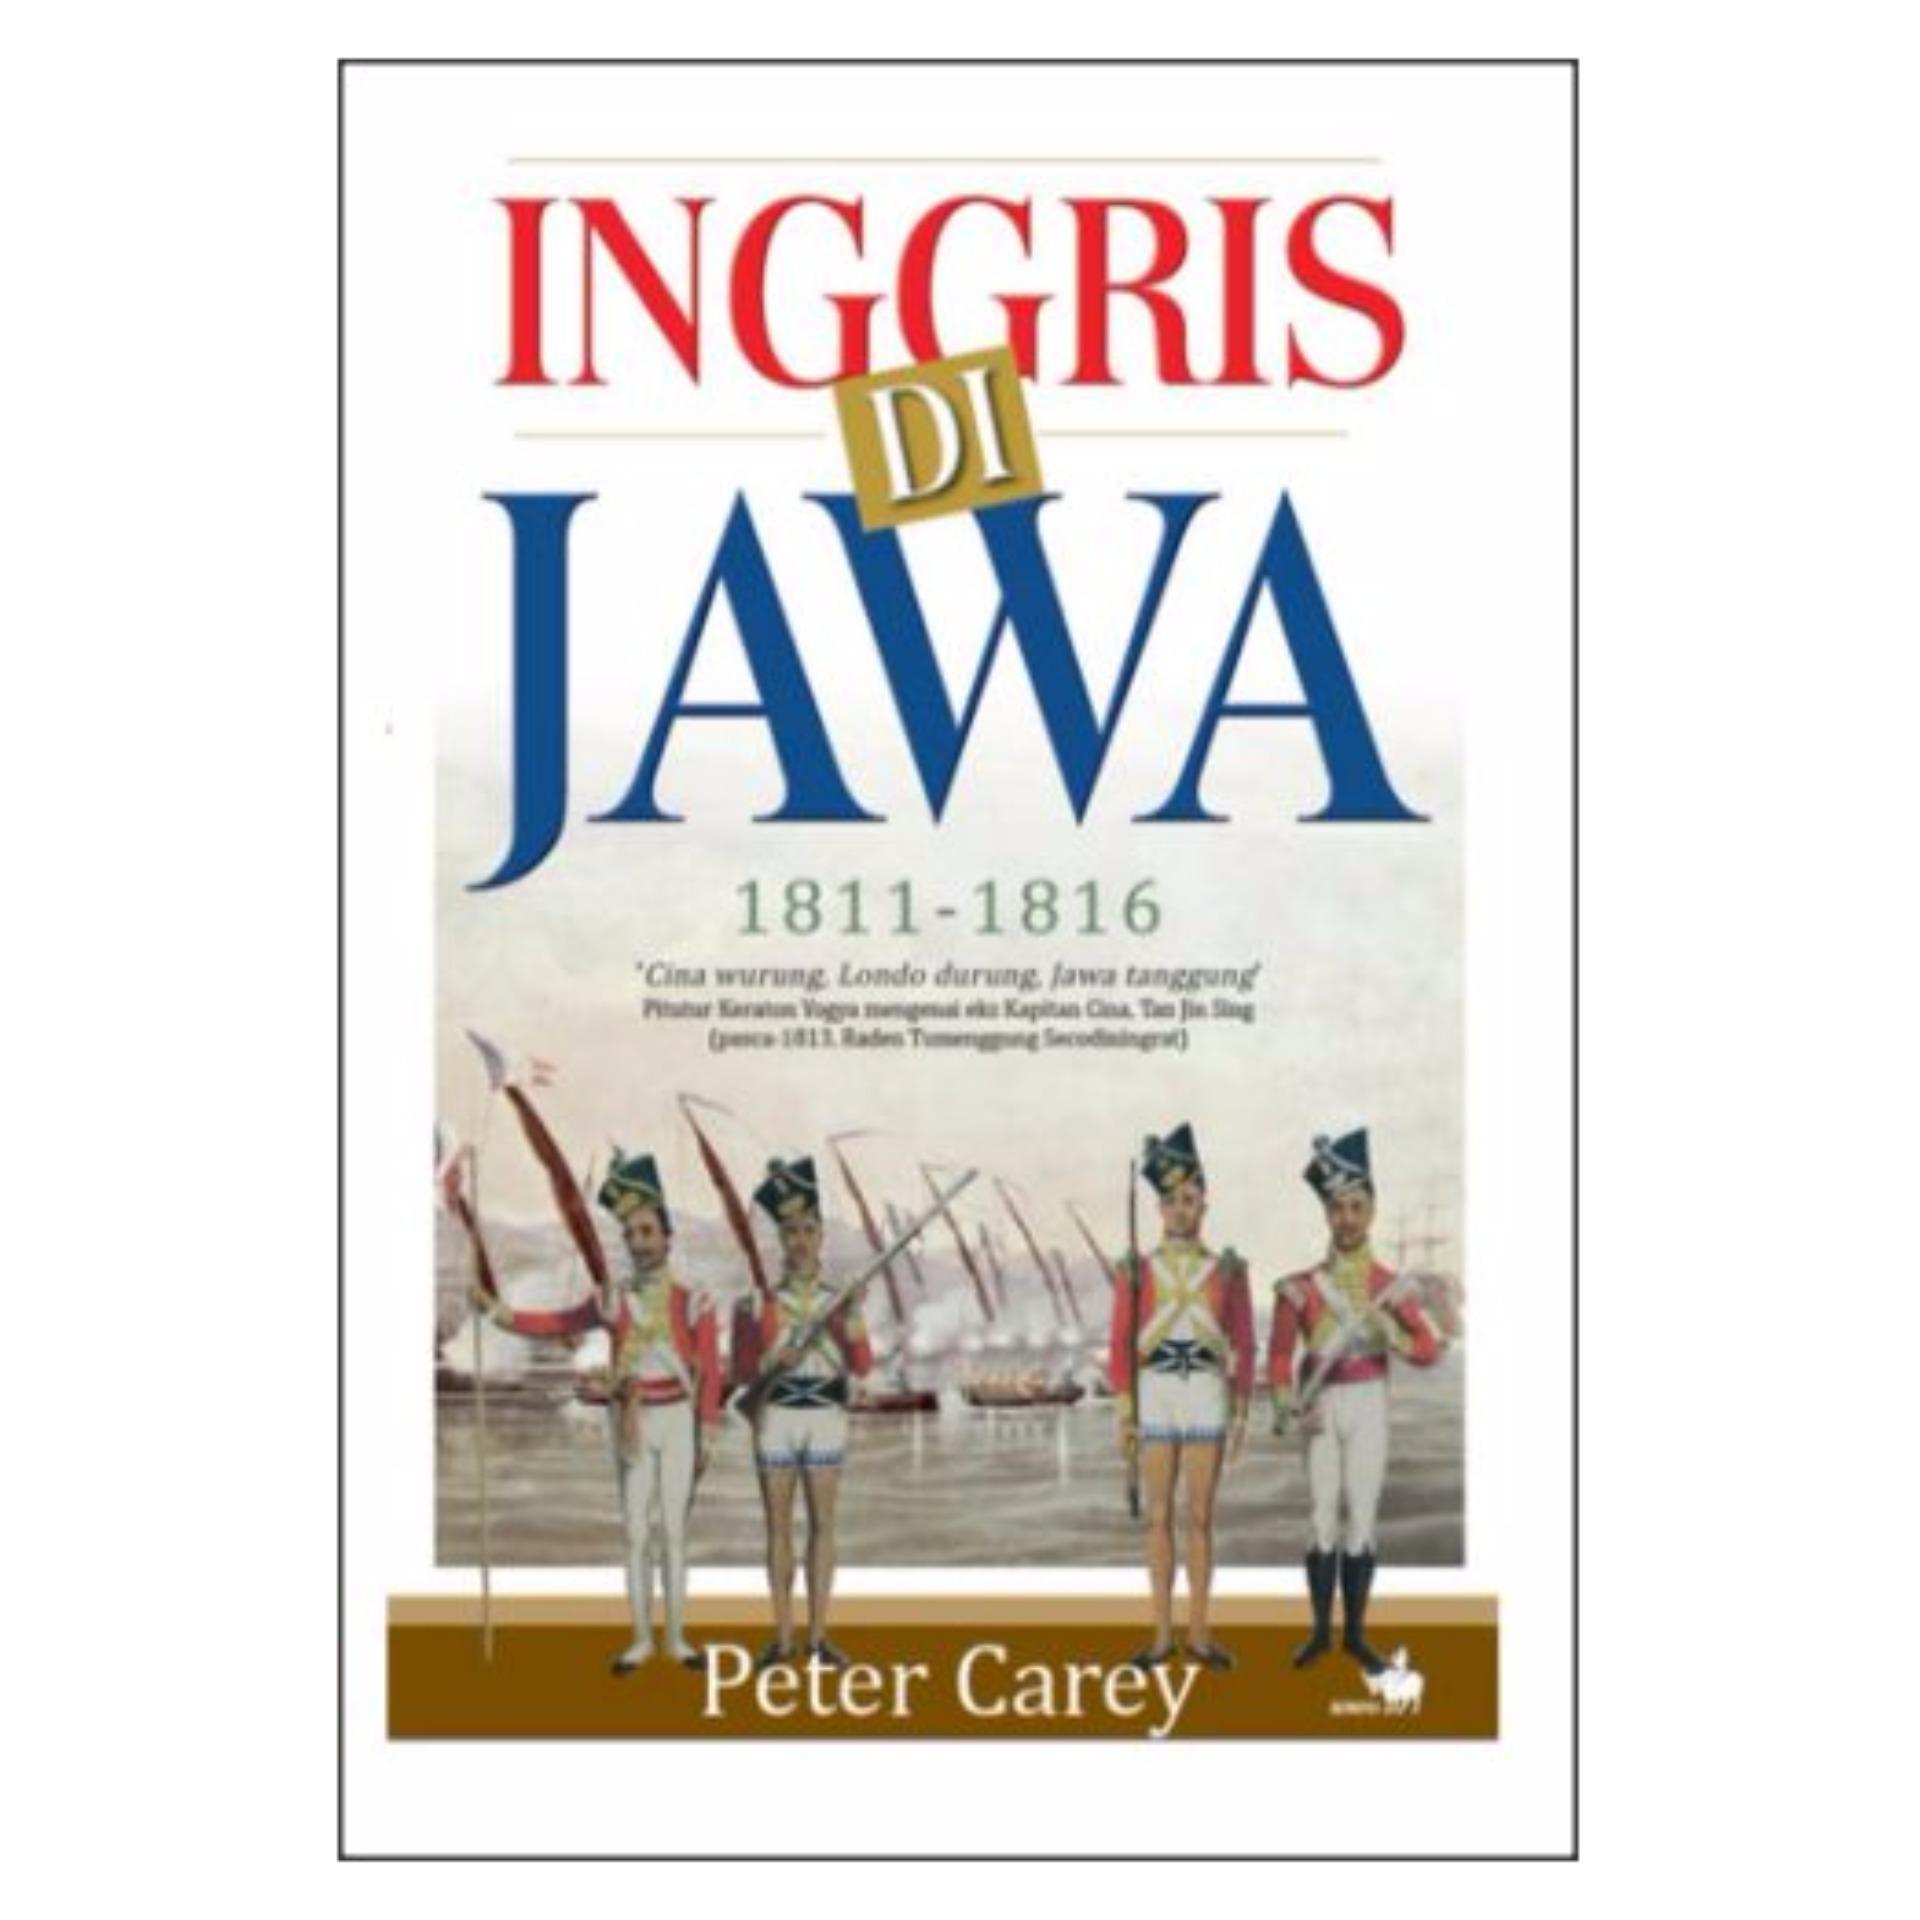 Flash Sale Inggris Di Jawa 1811 - 1816 - Peter Carey